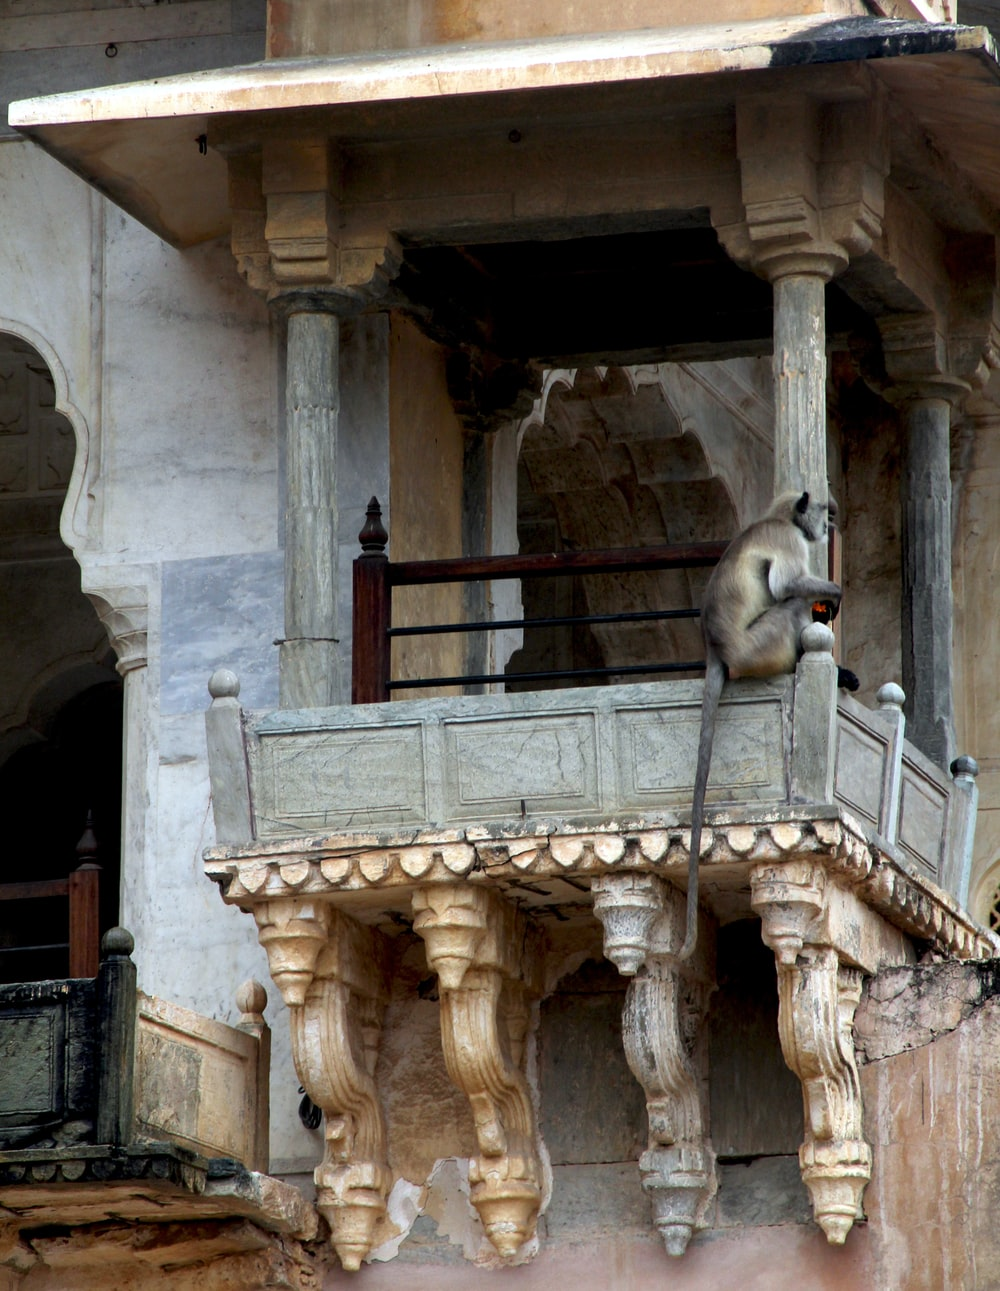 gray monkey on brown wooden balustrade